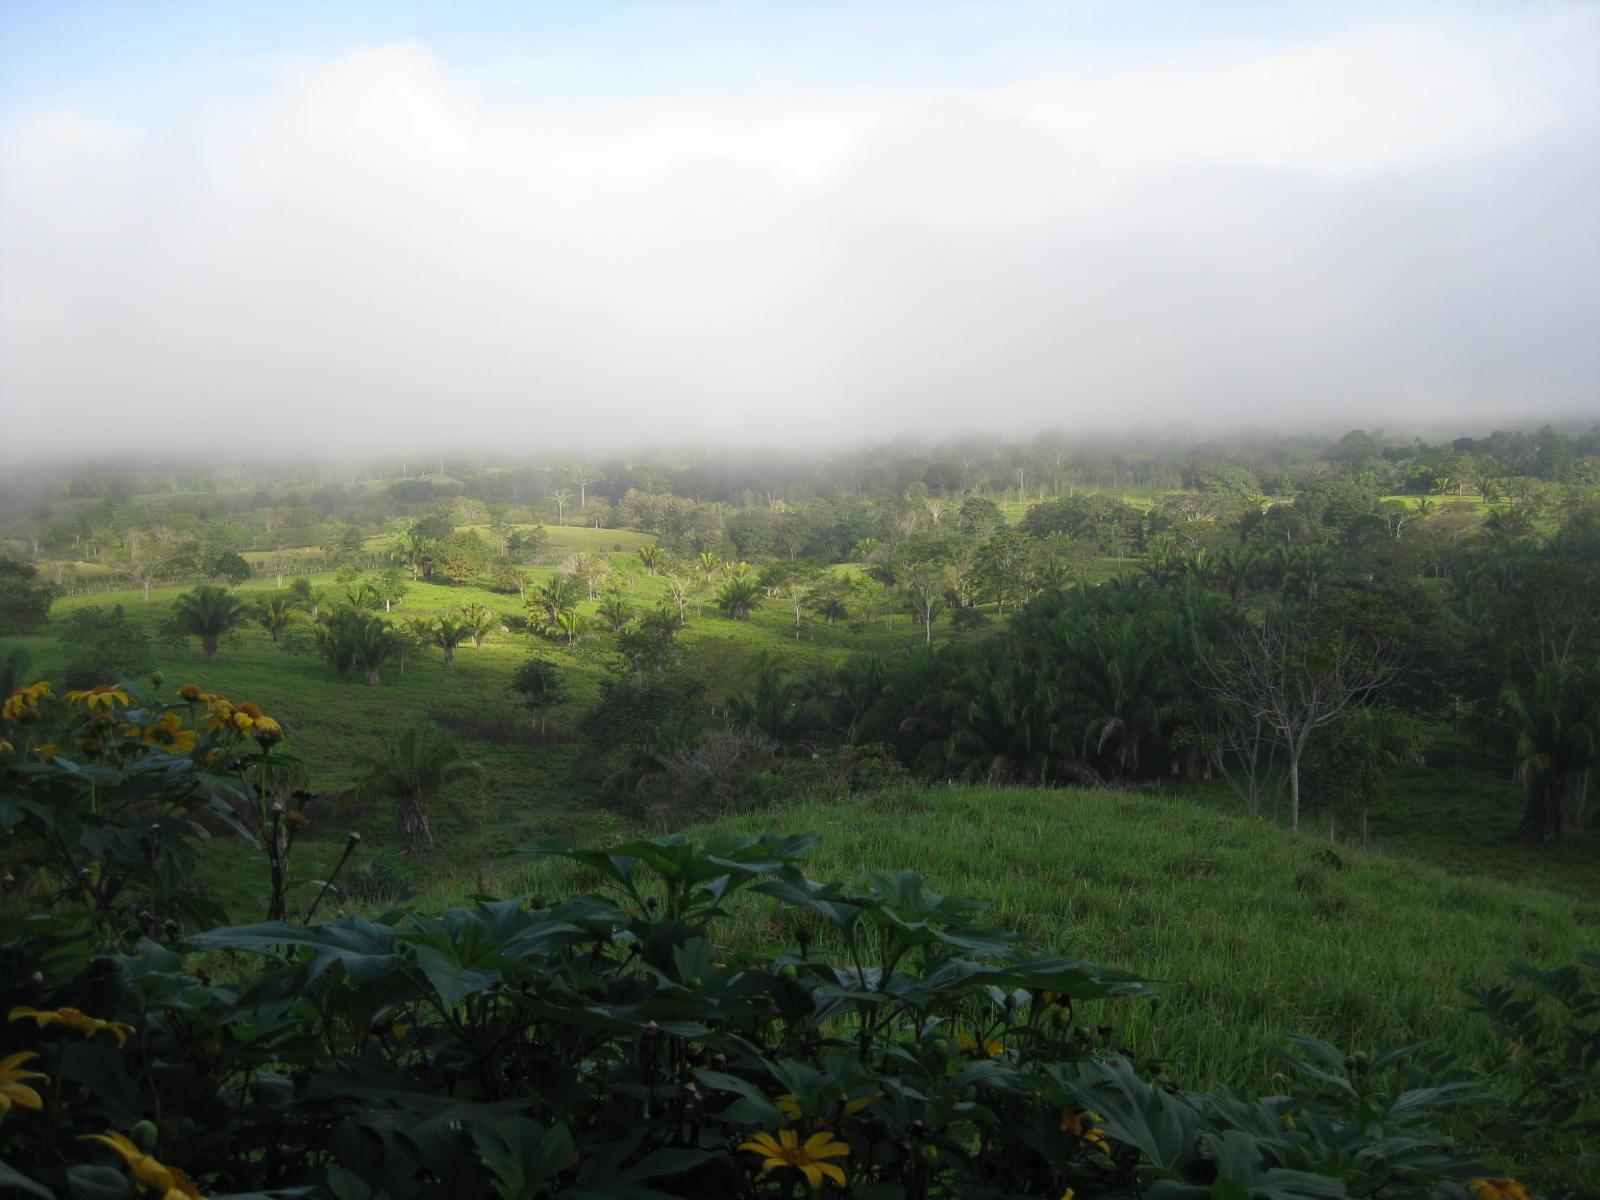 Fog over landscape in panama